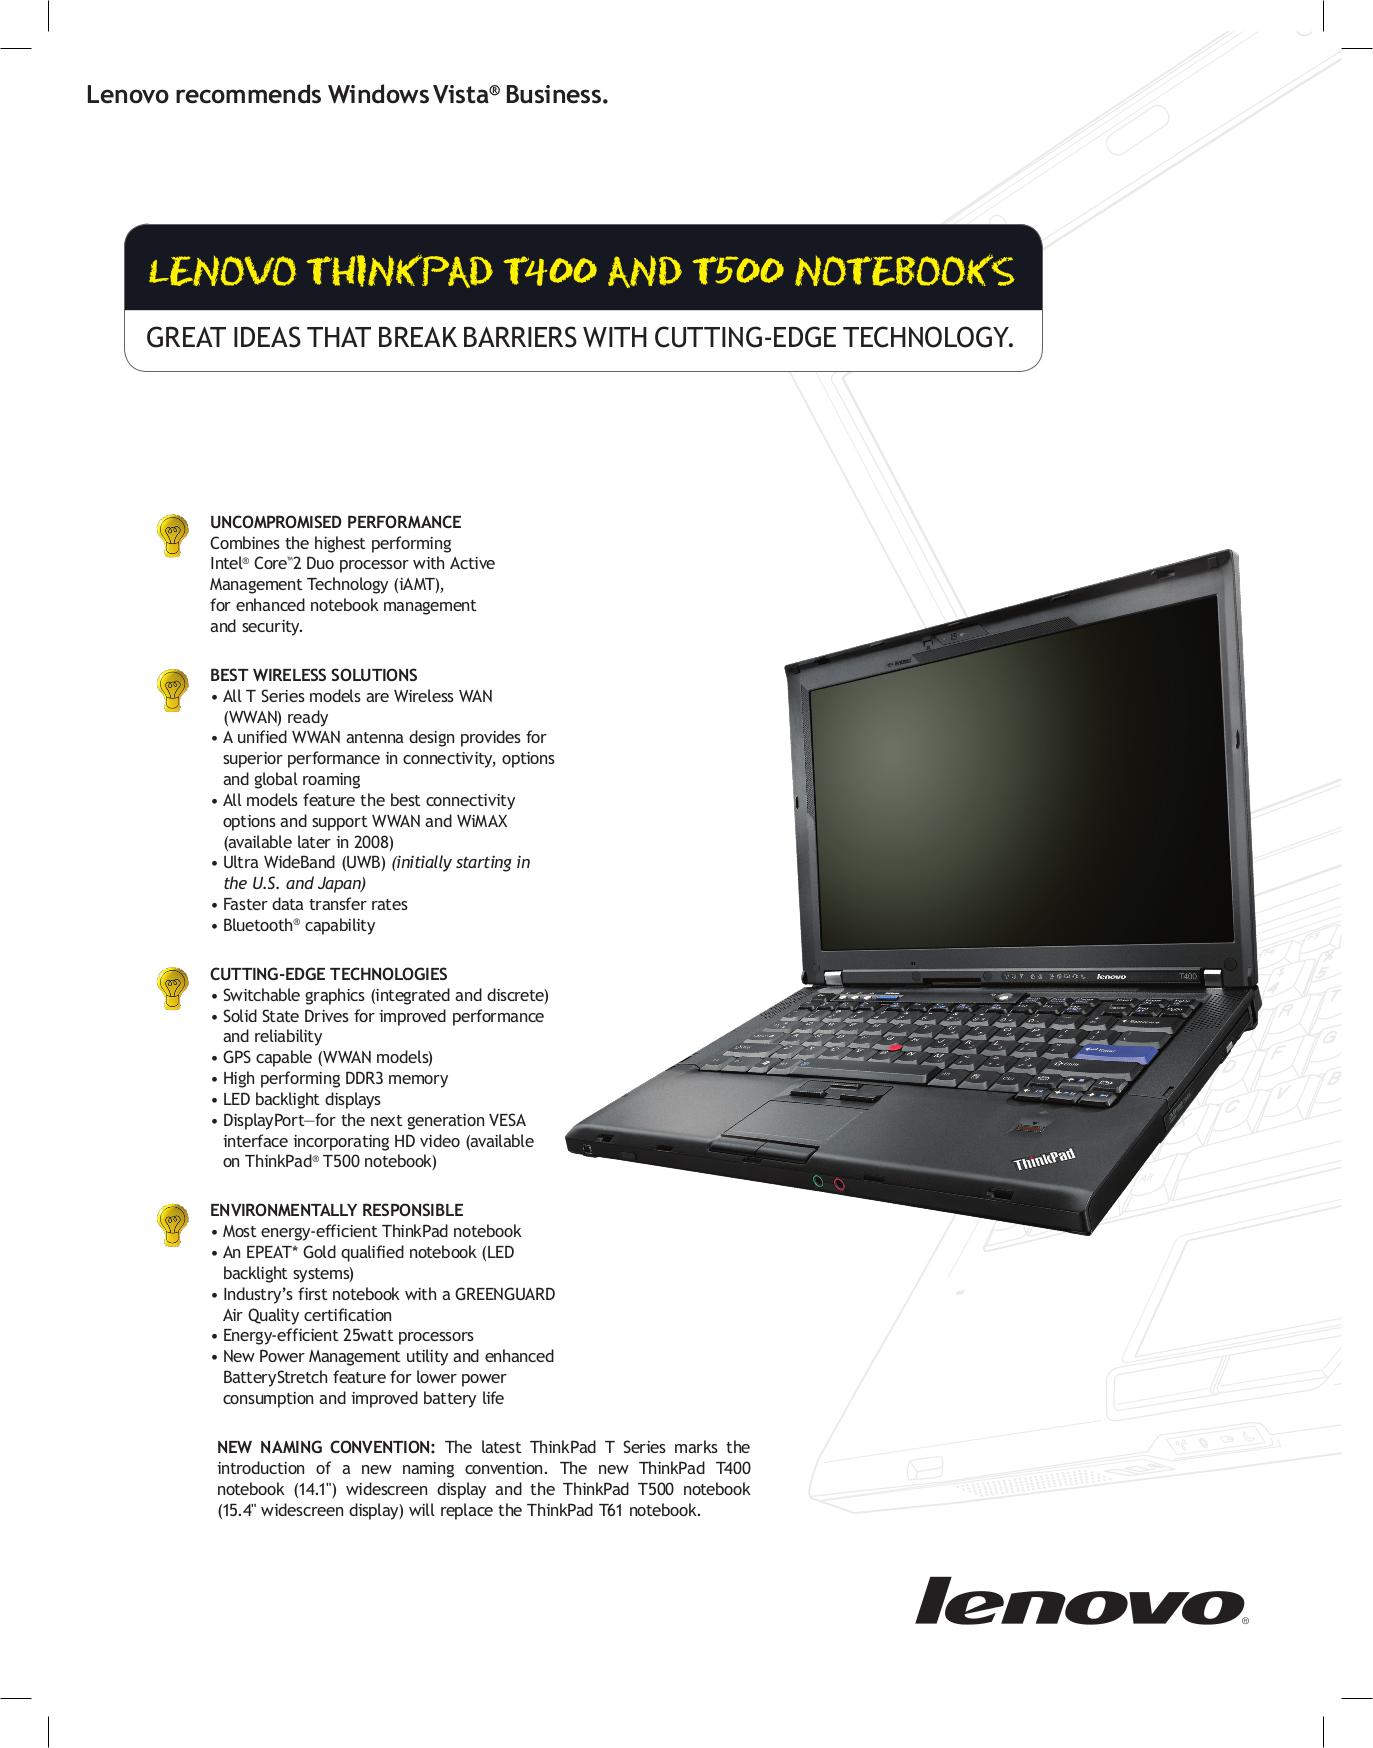 Download Free Pdf For Lenovo ThinkPad R500 2716 Laptop Manual